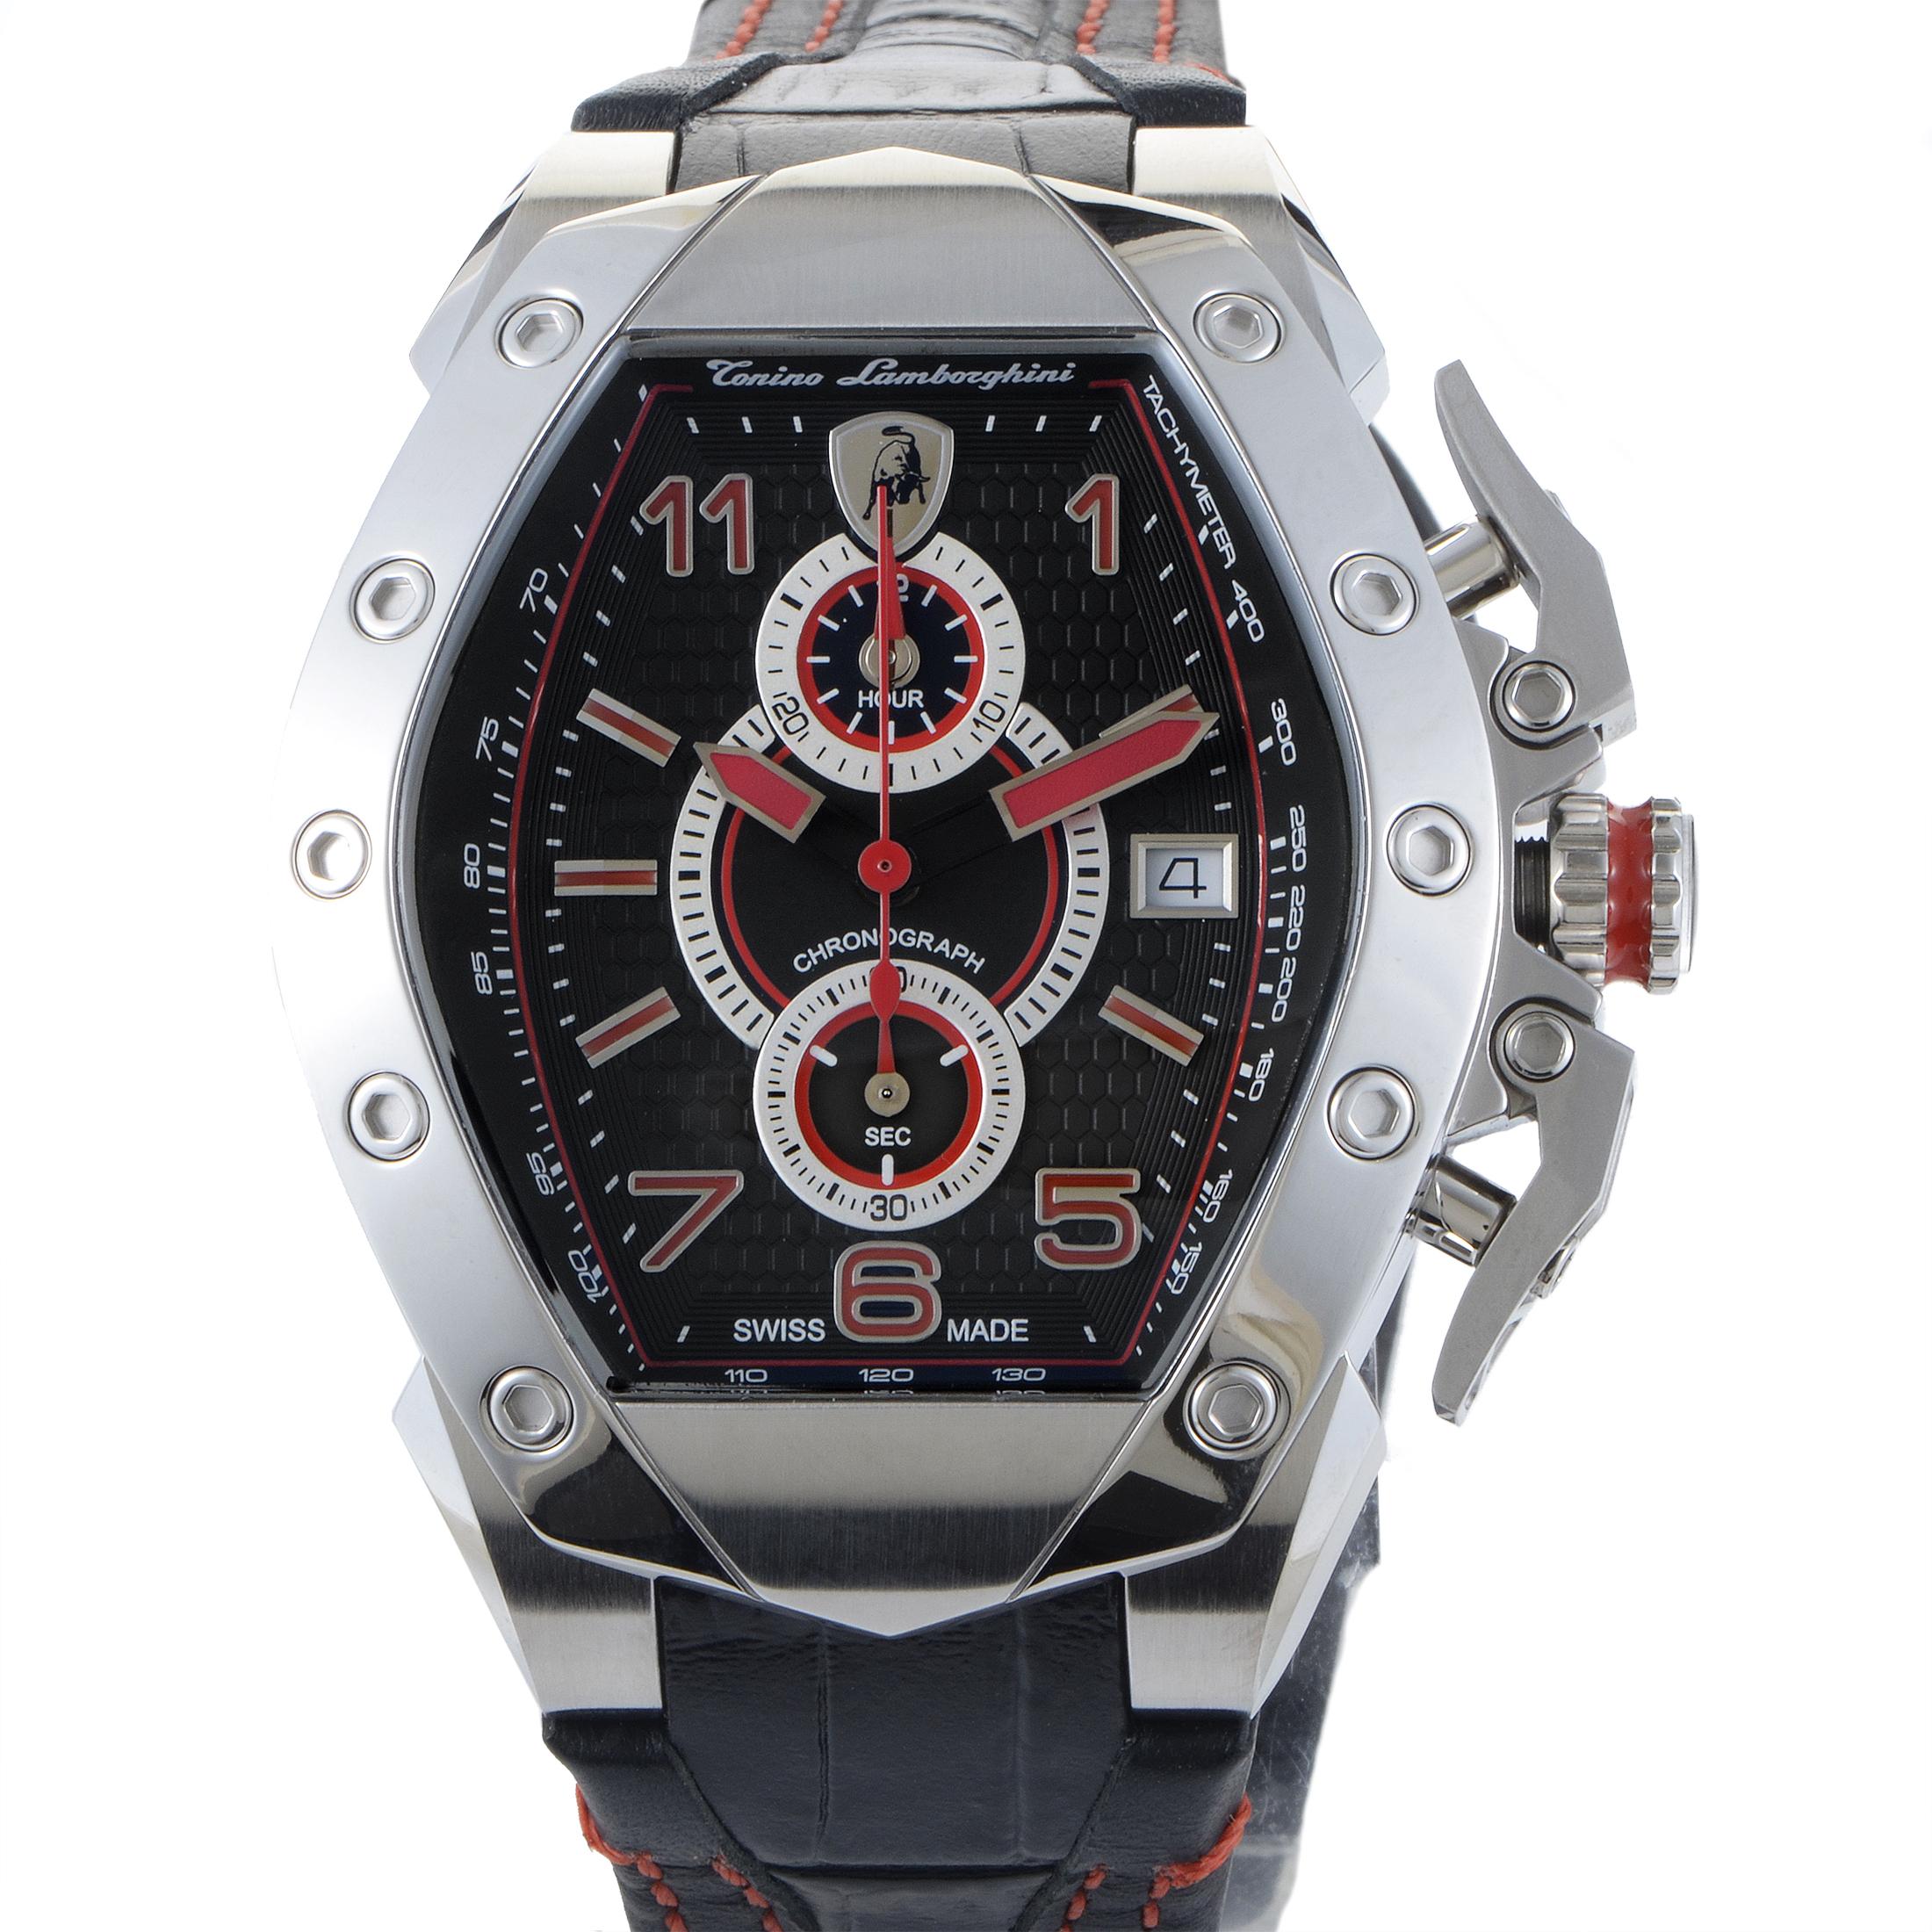 Men's GT3 Stainless Steel Quartz Chronograph Watch GT3-01